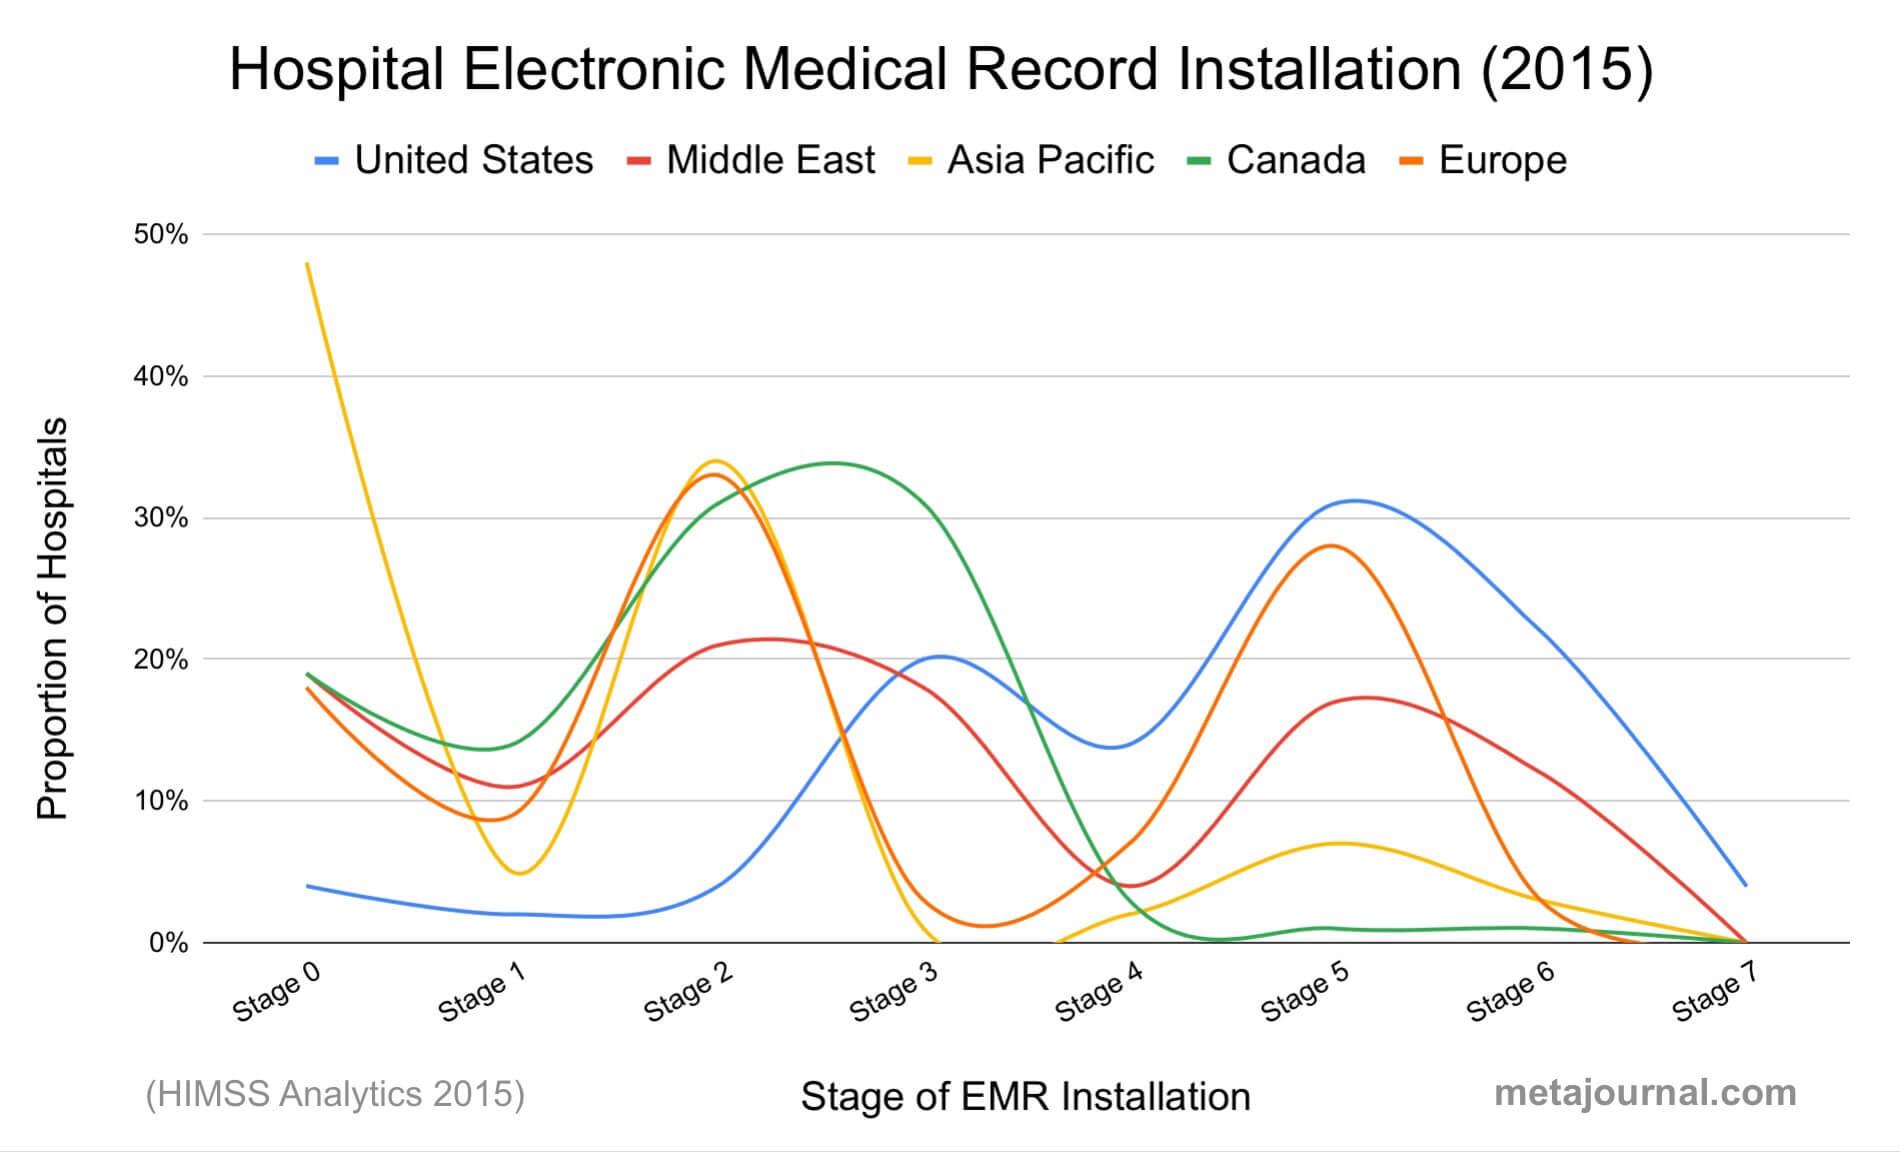 Global adoption of electronic medical records via EMRAM stages